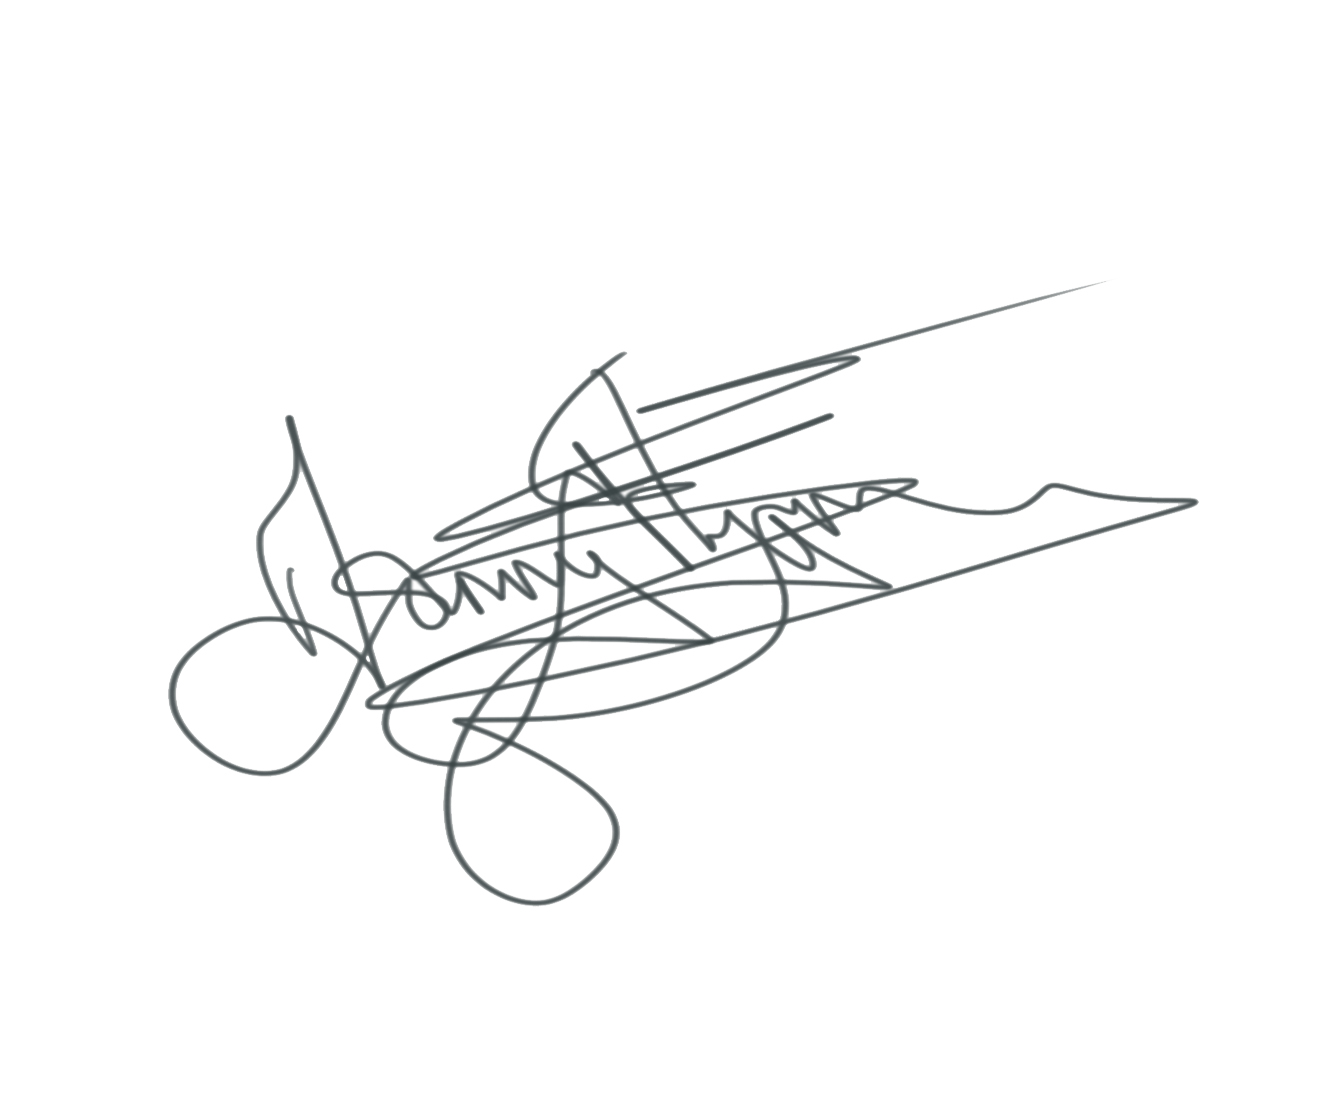 Danny Flynn's Signature